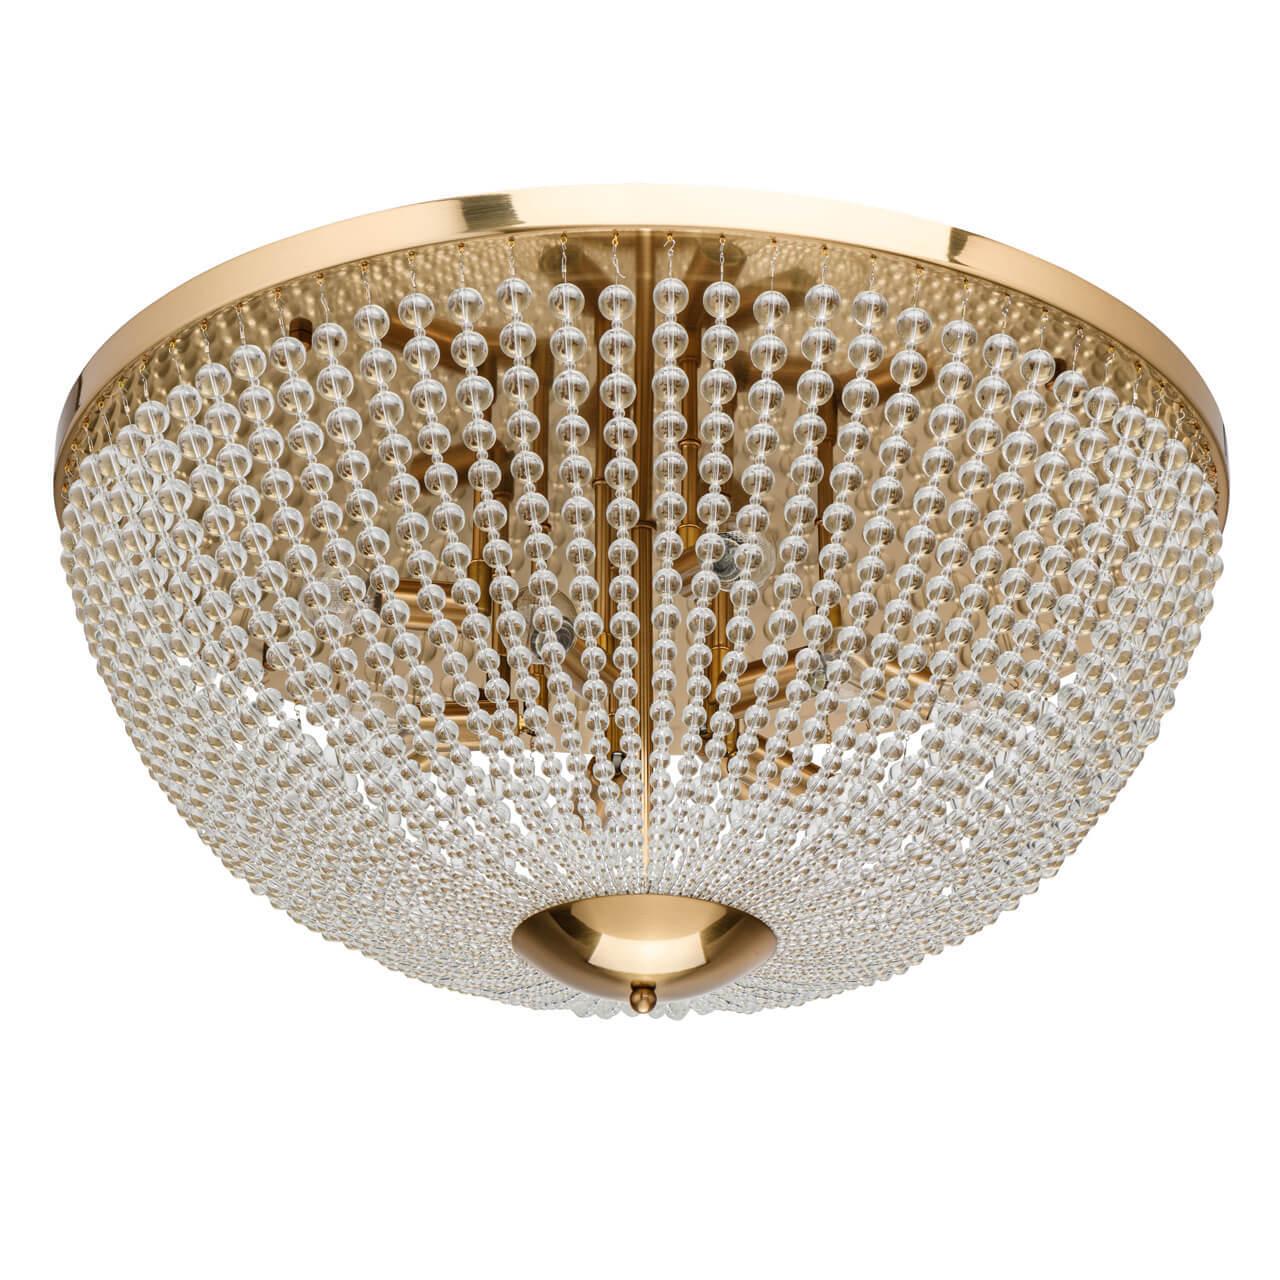 Люстра MW-Light 111012610 Бриз mw light потолочная люстра mw light бриз 464018309